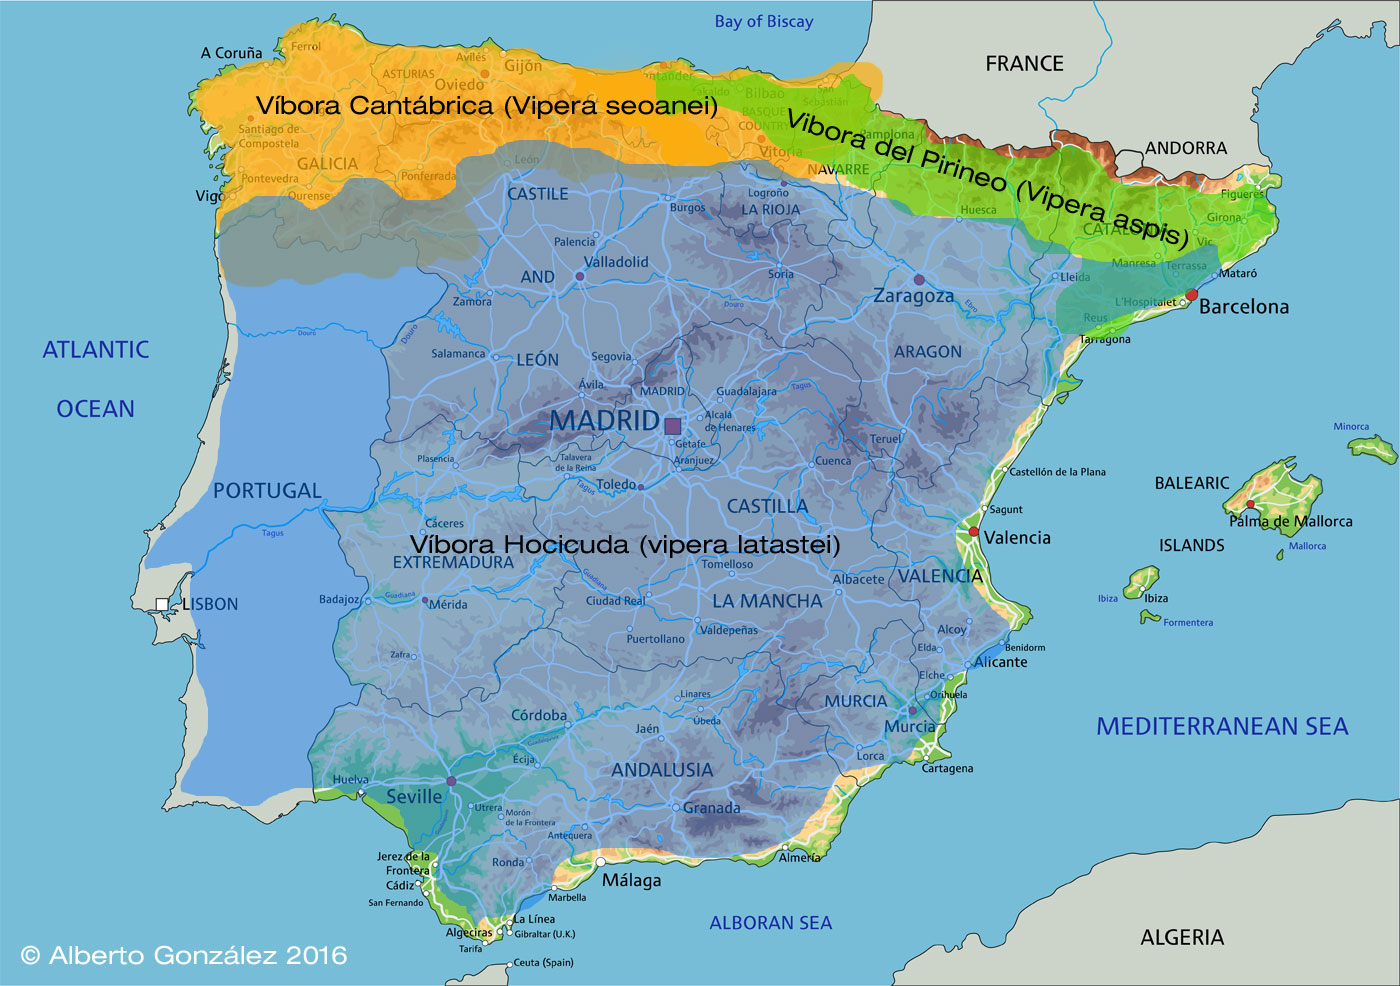 mapa especies de viboras en españa